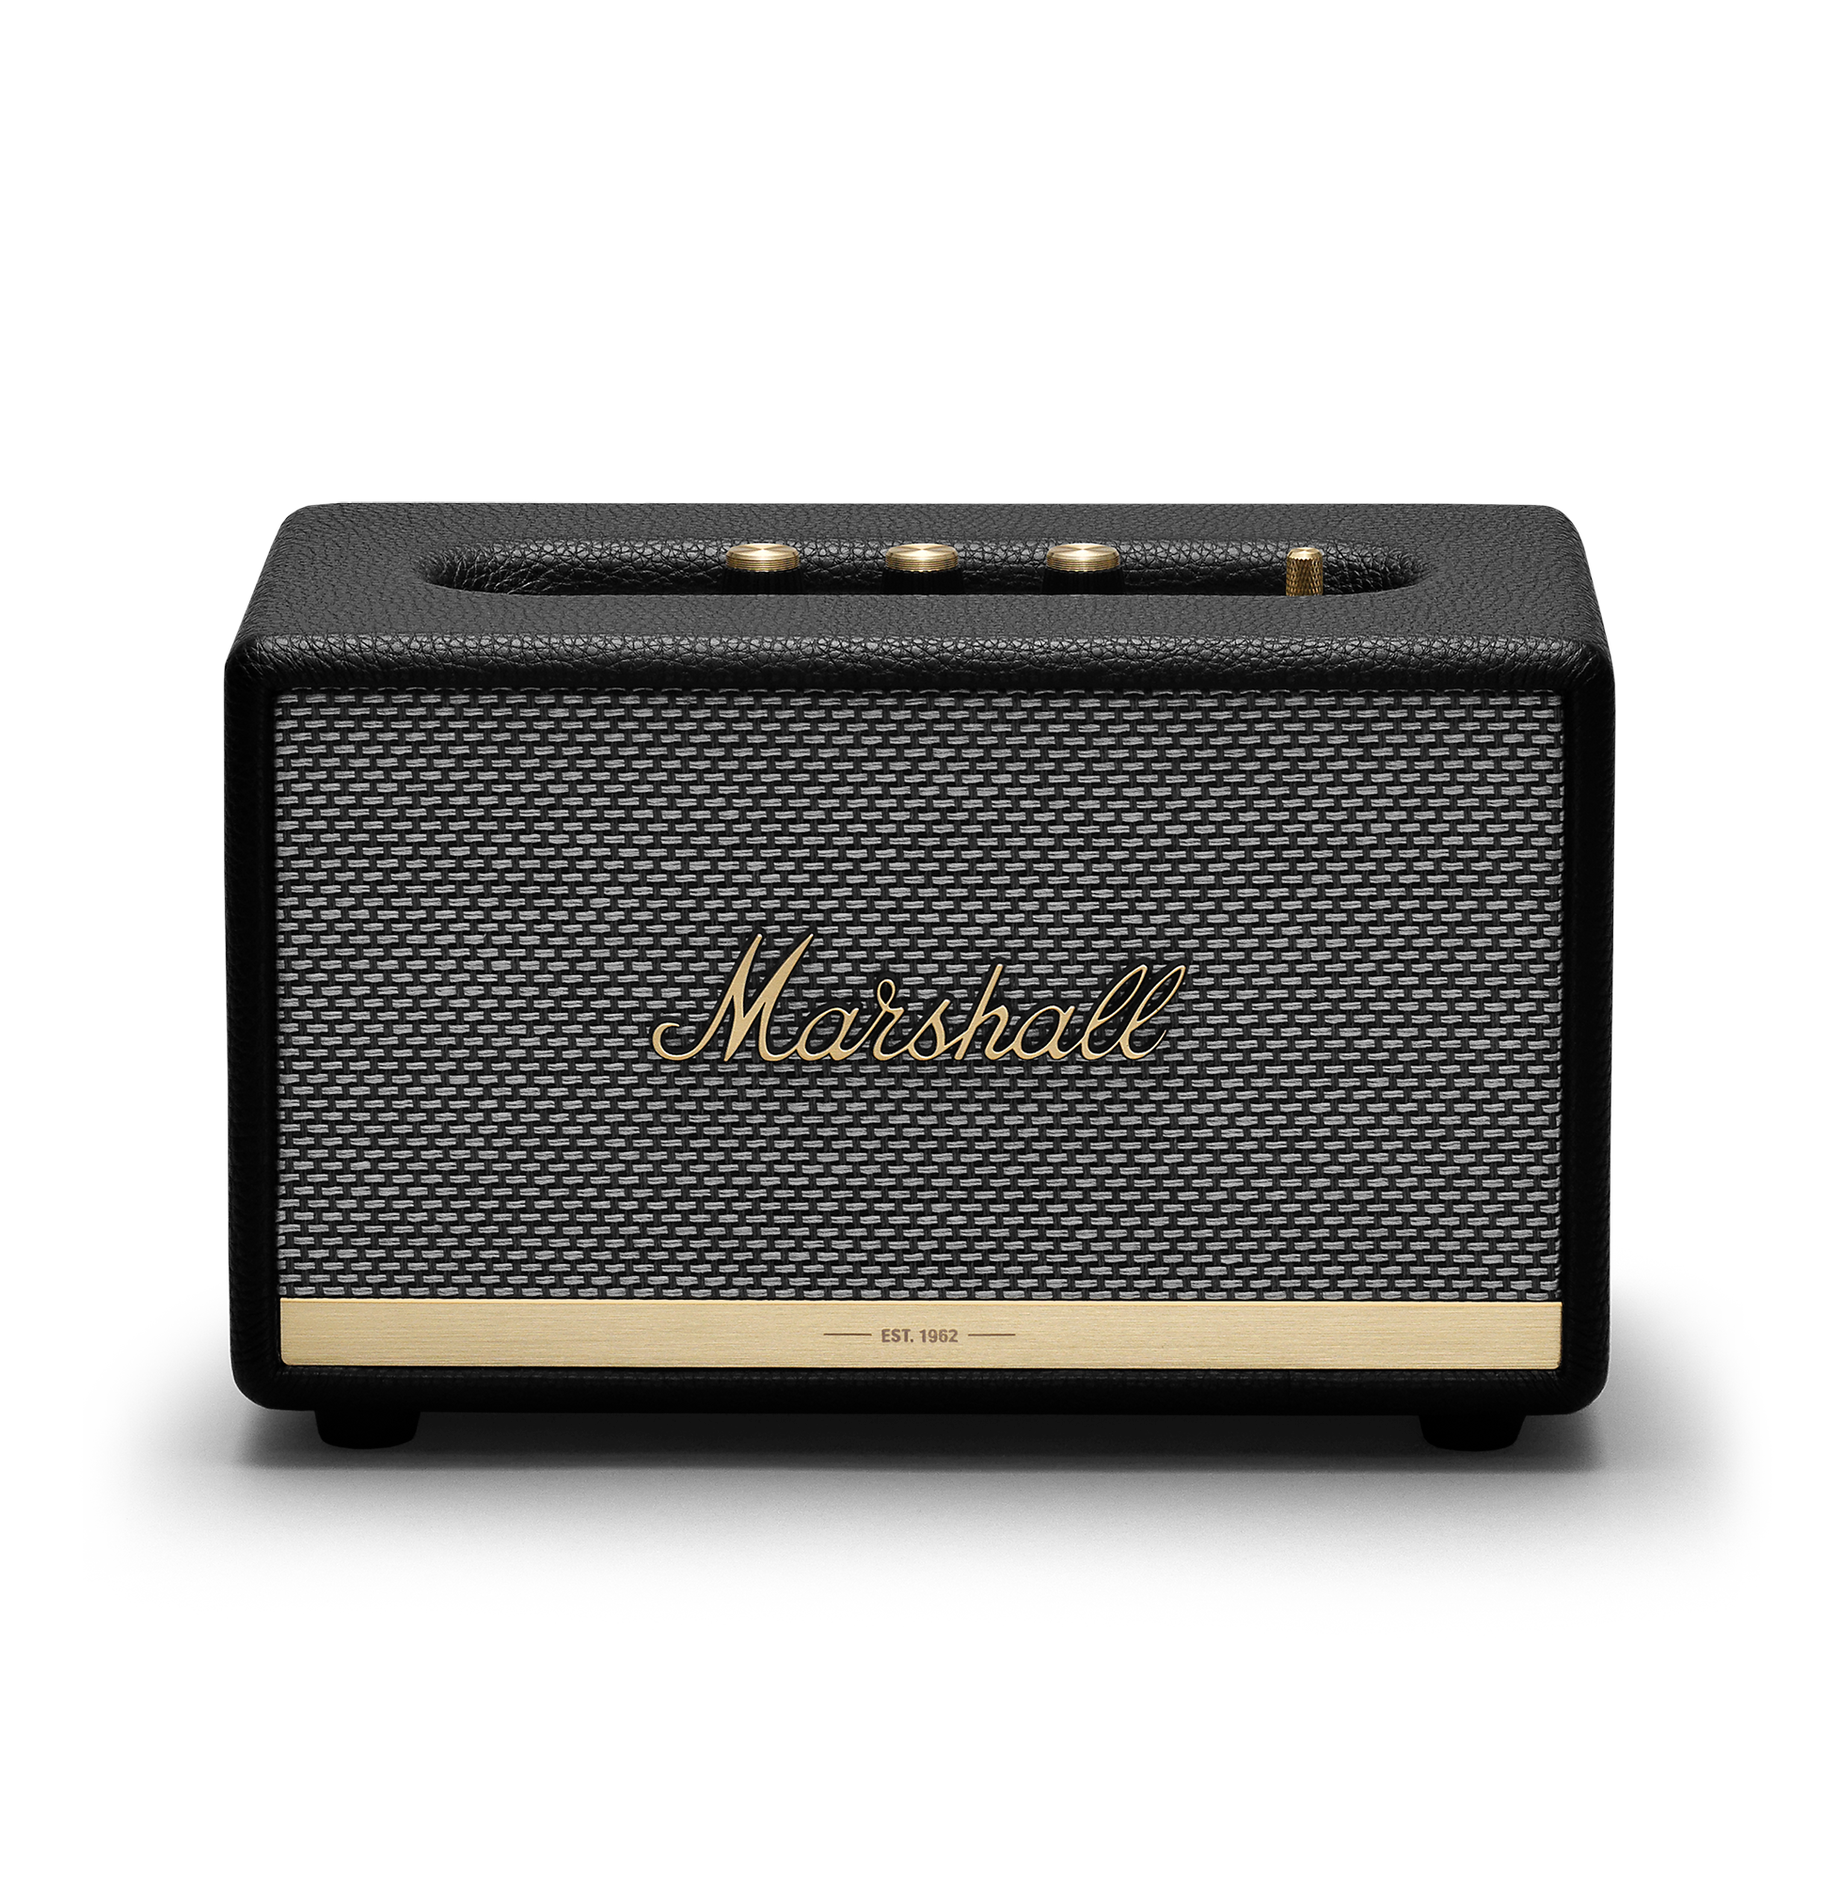 Marshall Action II Bluetooth